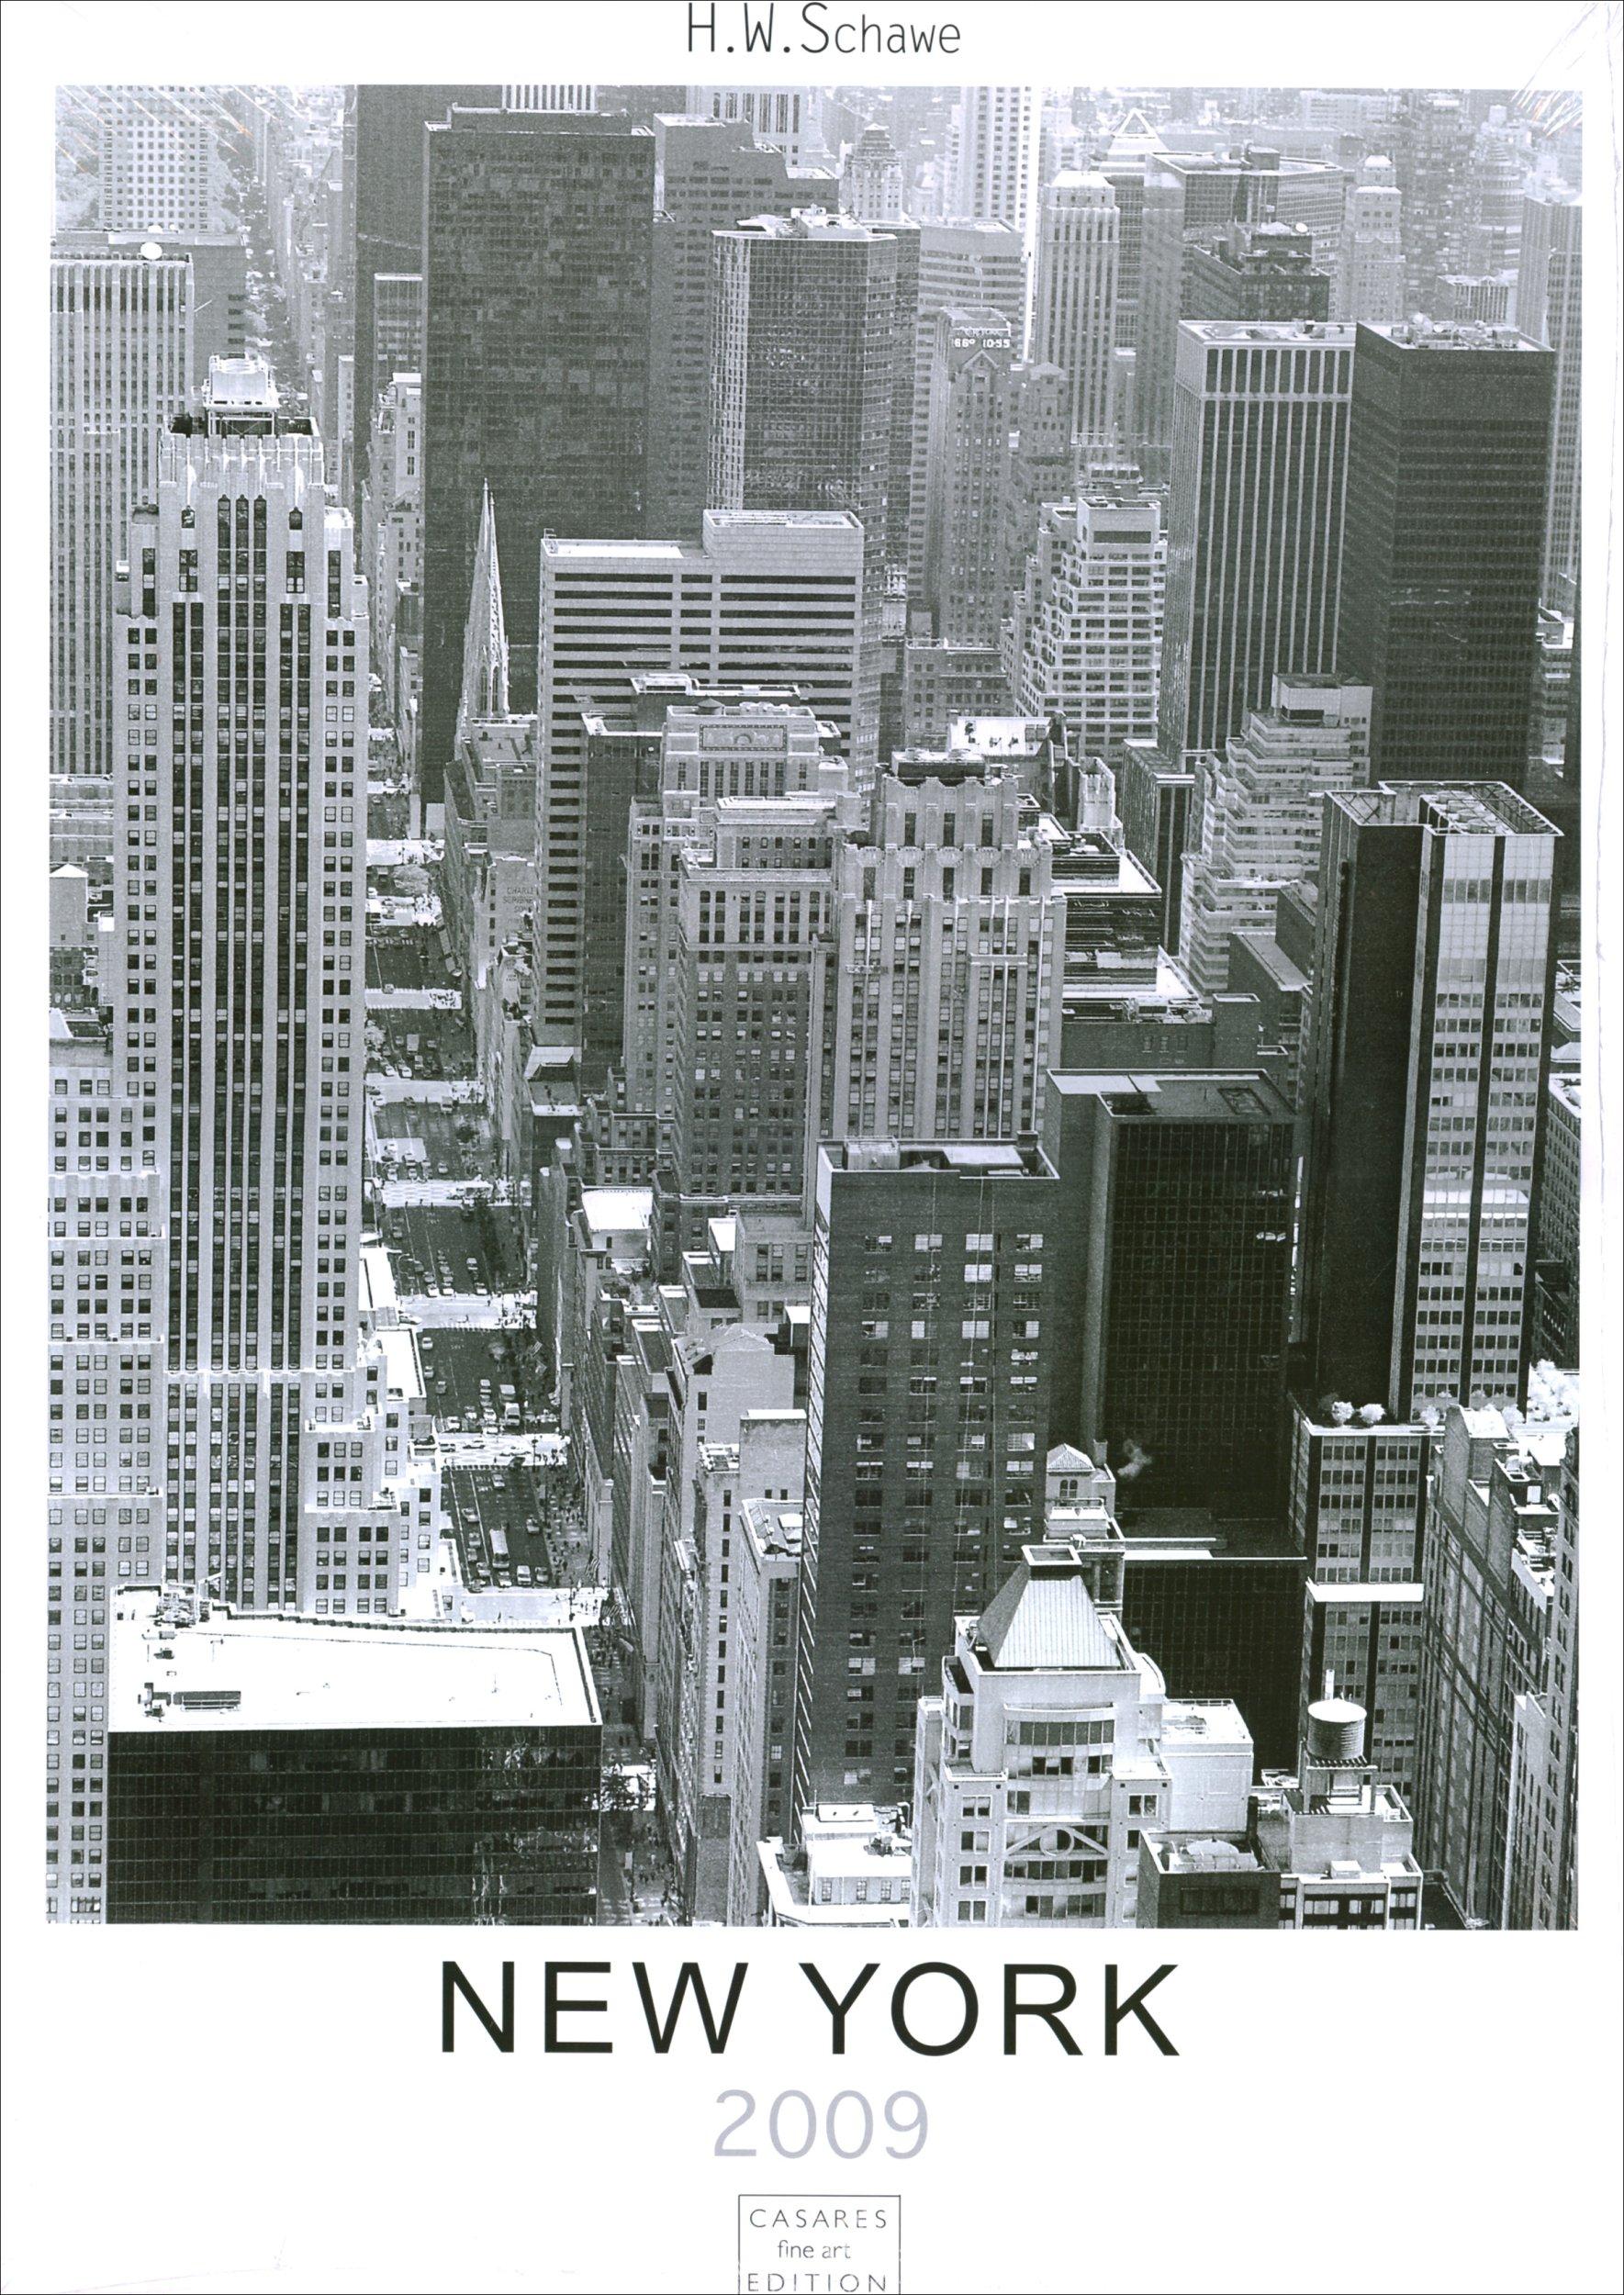 New York (59 x 42 cm) 2009